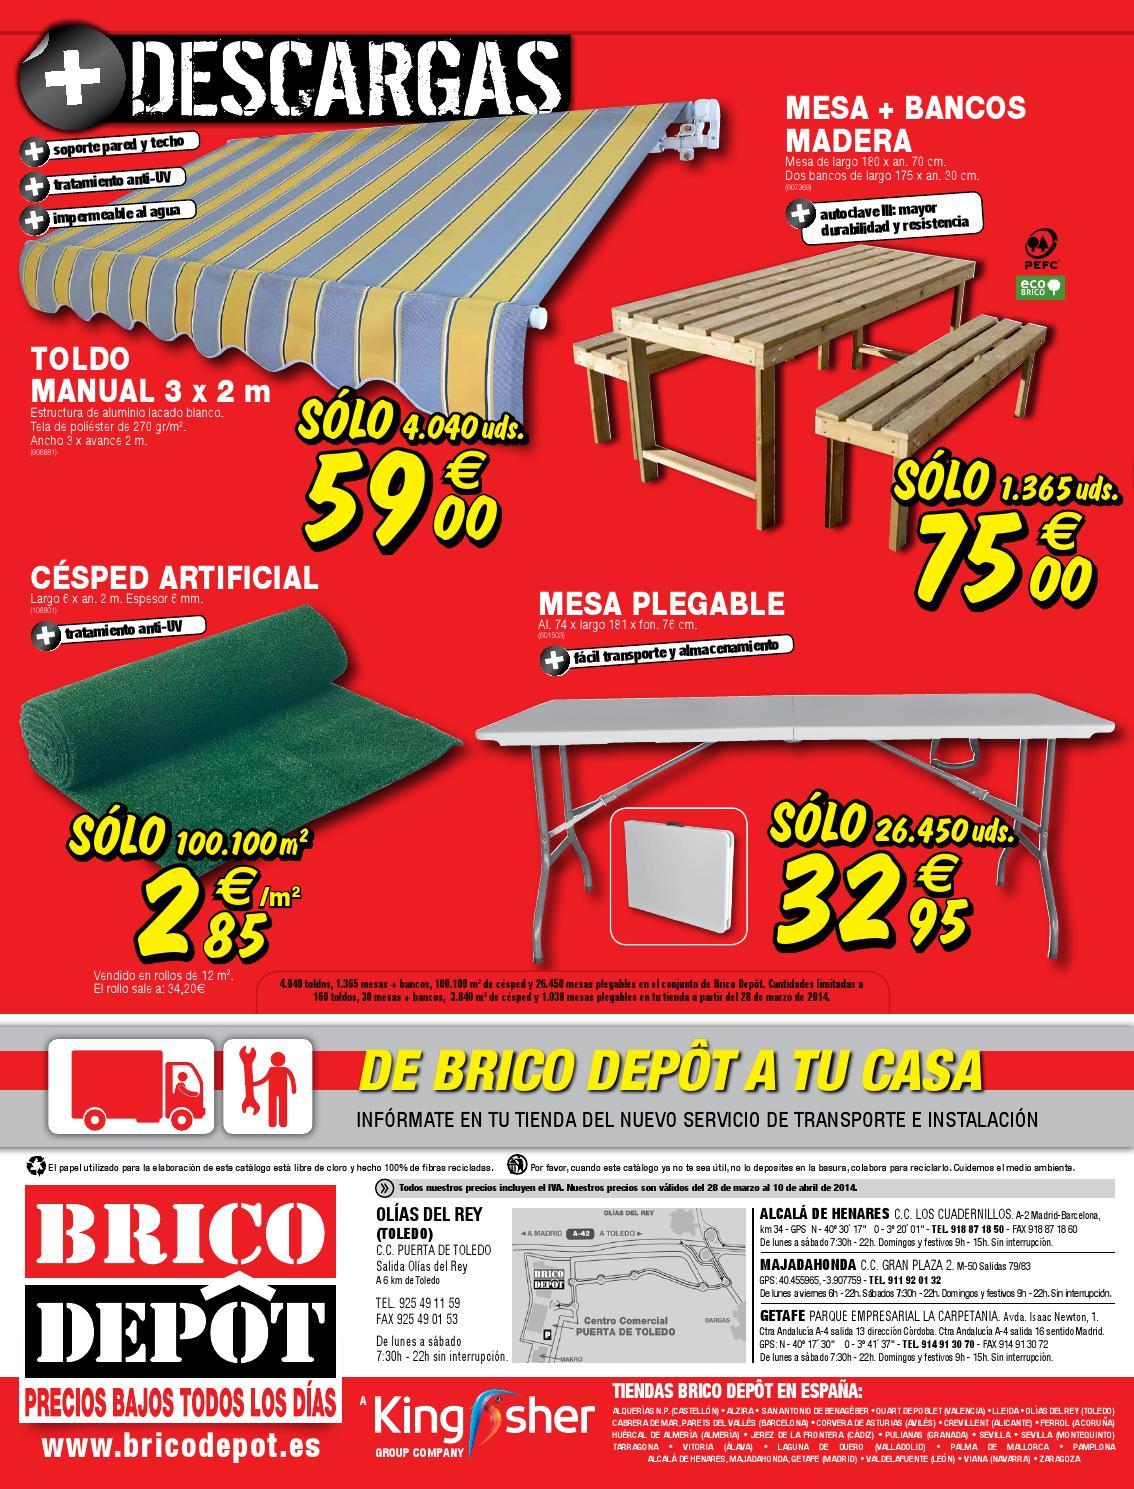 28marzo Catalogue 10abril2014 By Bricodepot yYmf7gIvb6